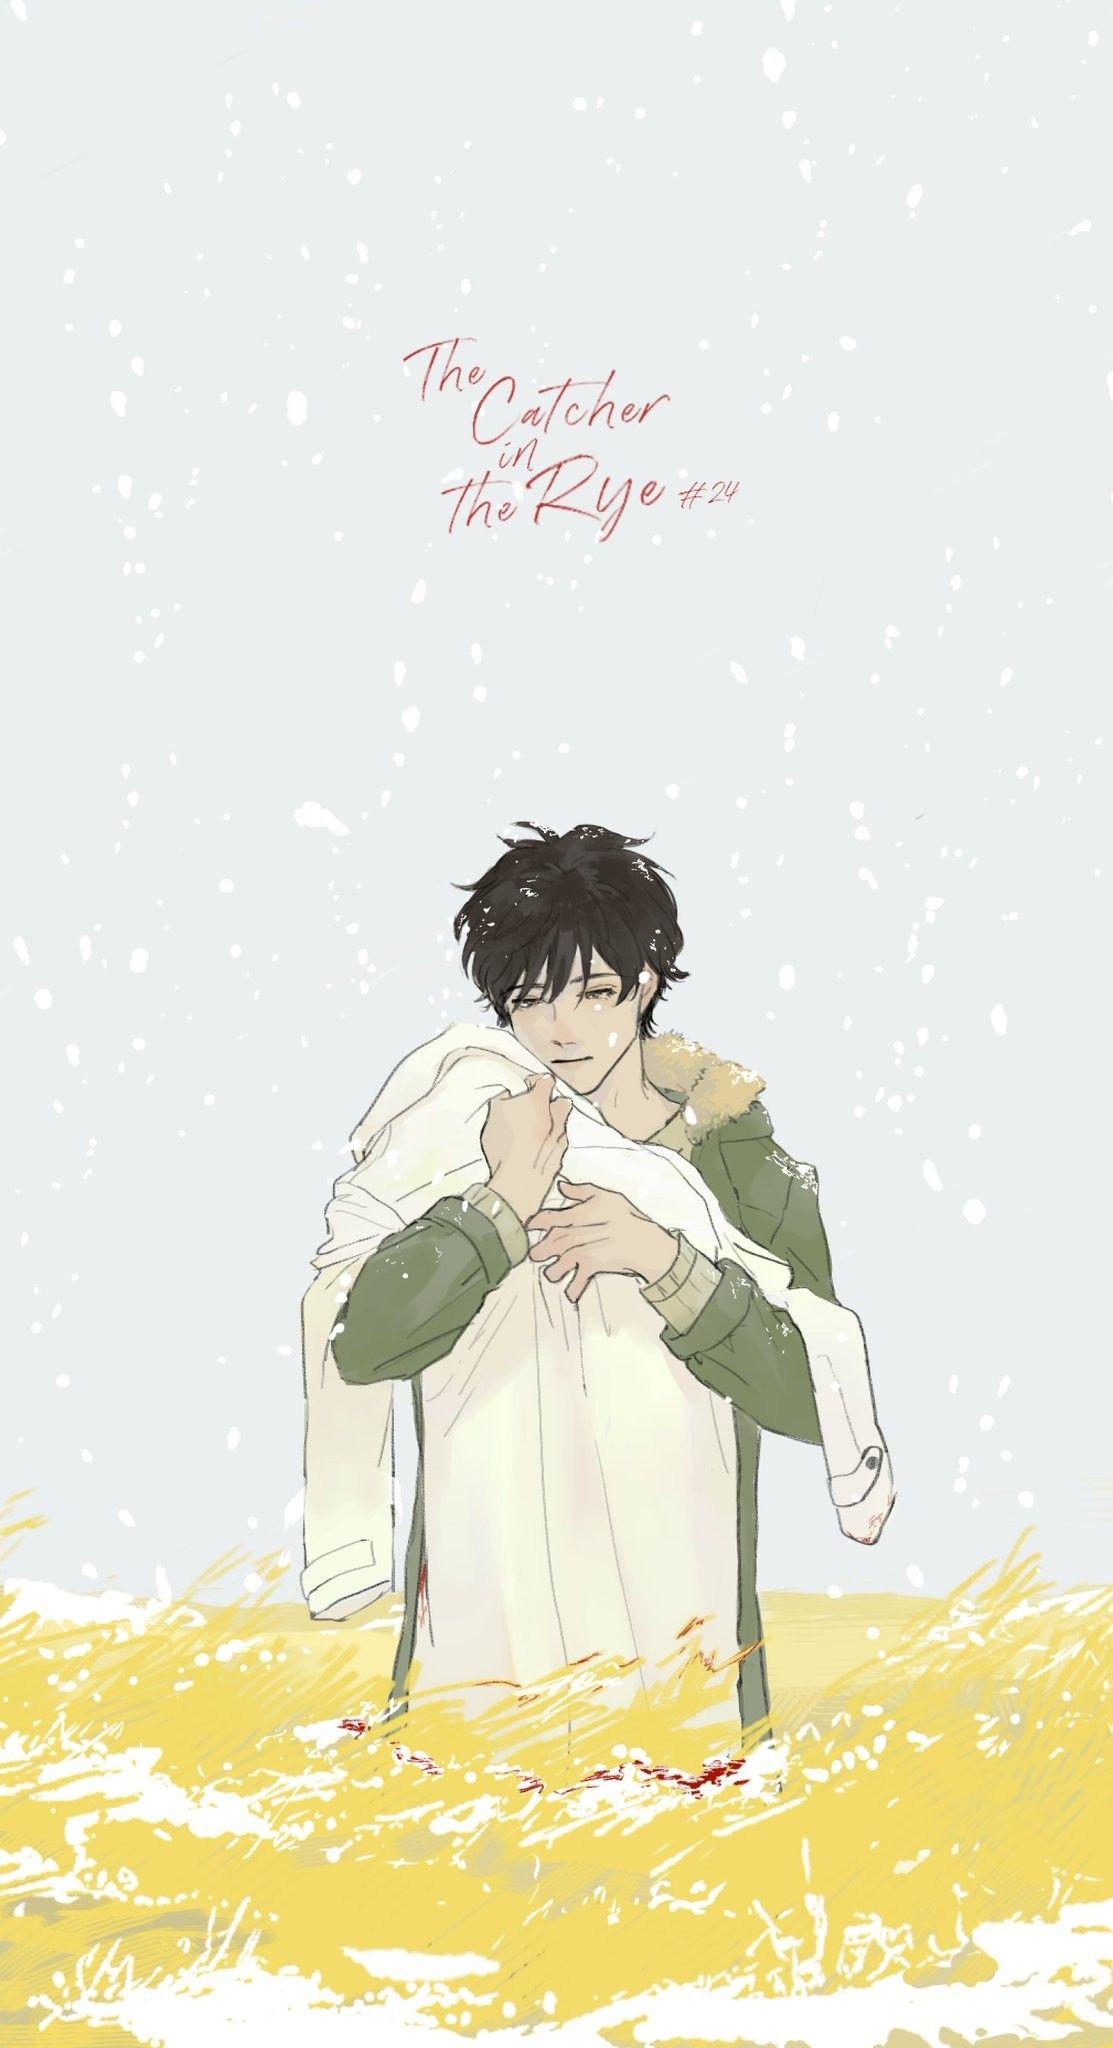 The Catcher In The Rye Last Episode Of Banana Fish Eiji In 2020 Anime Wallpaper Aesthetic Anime Cute Anime Wallpaper